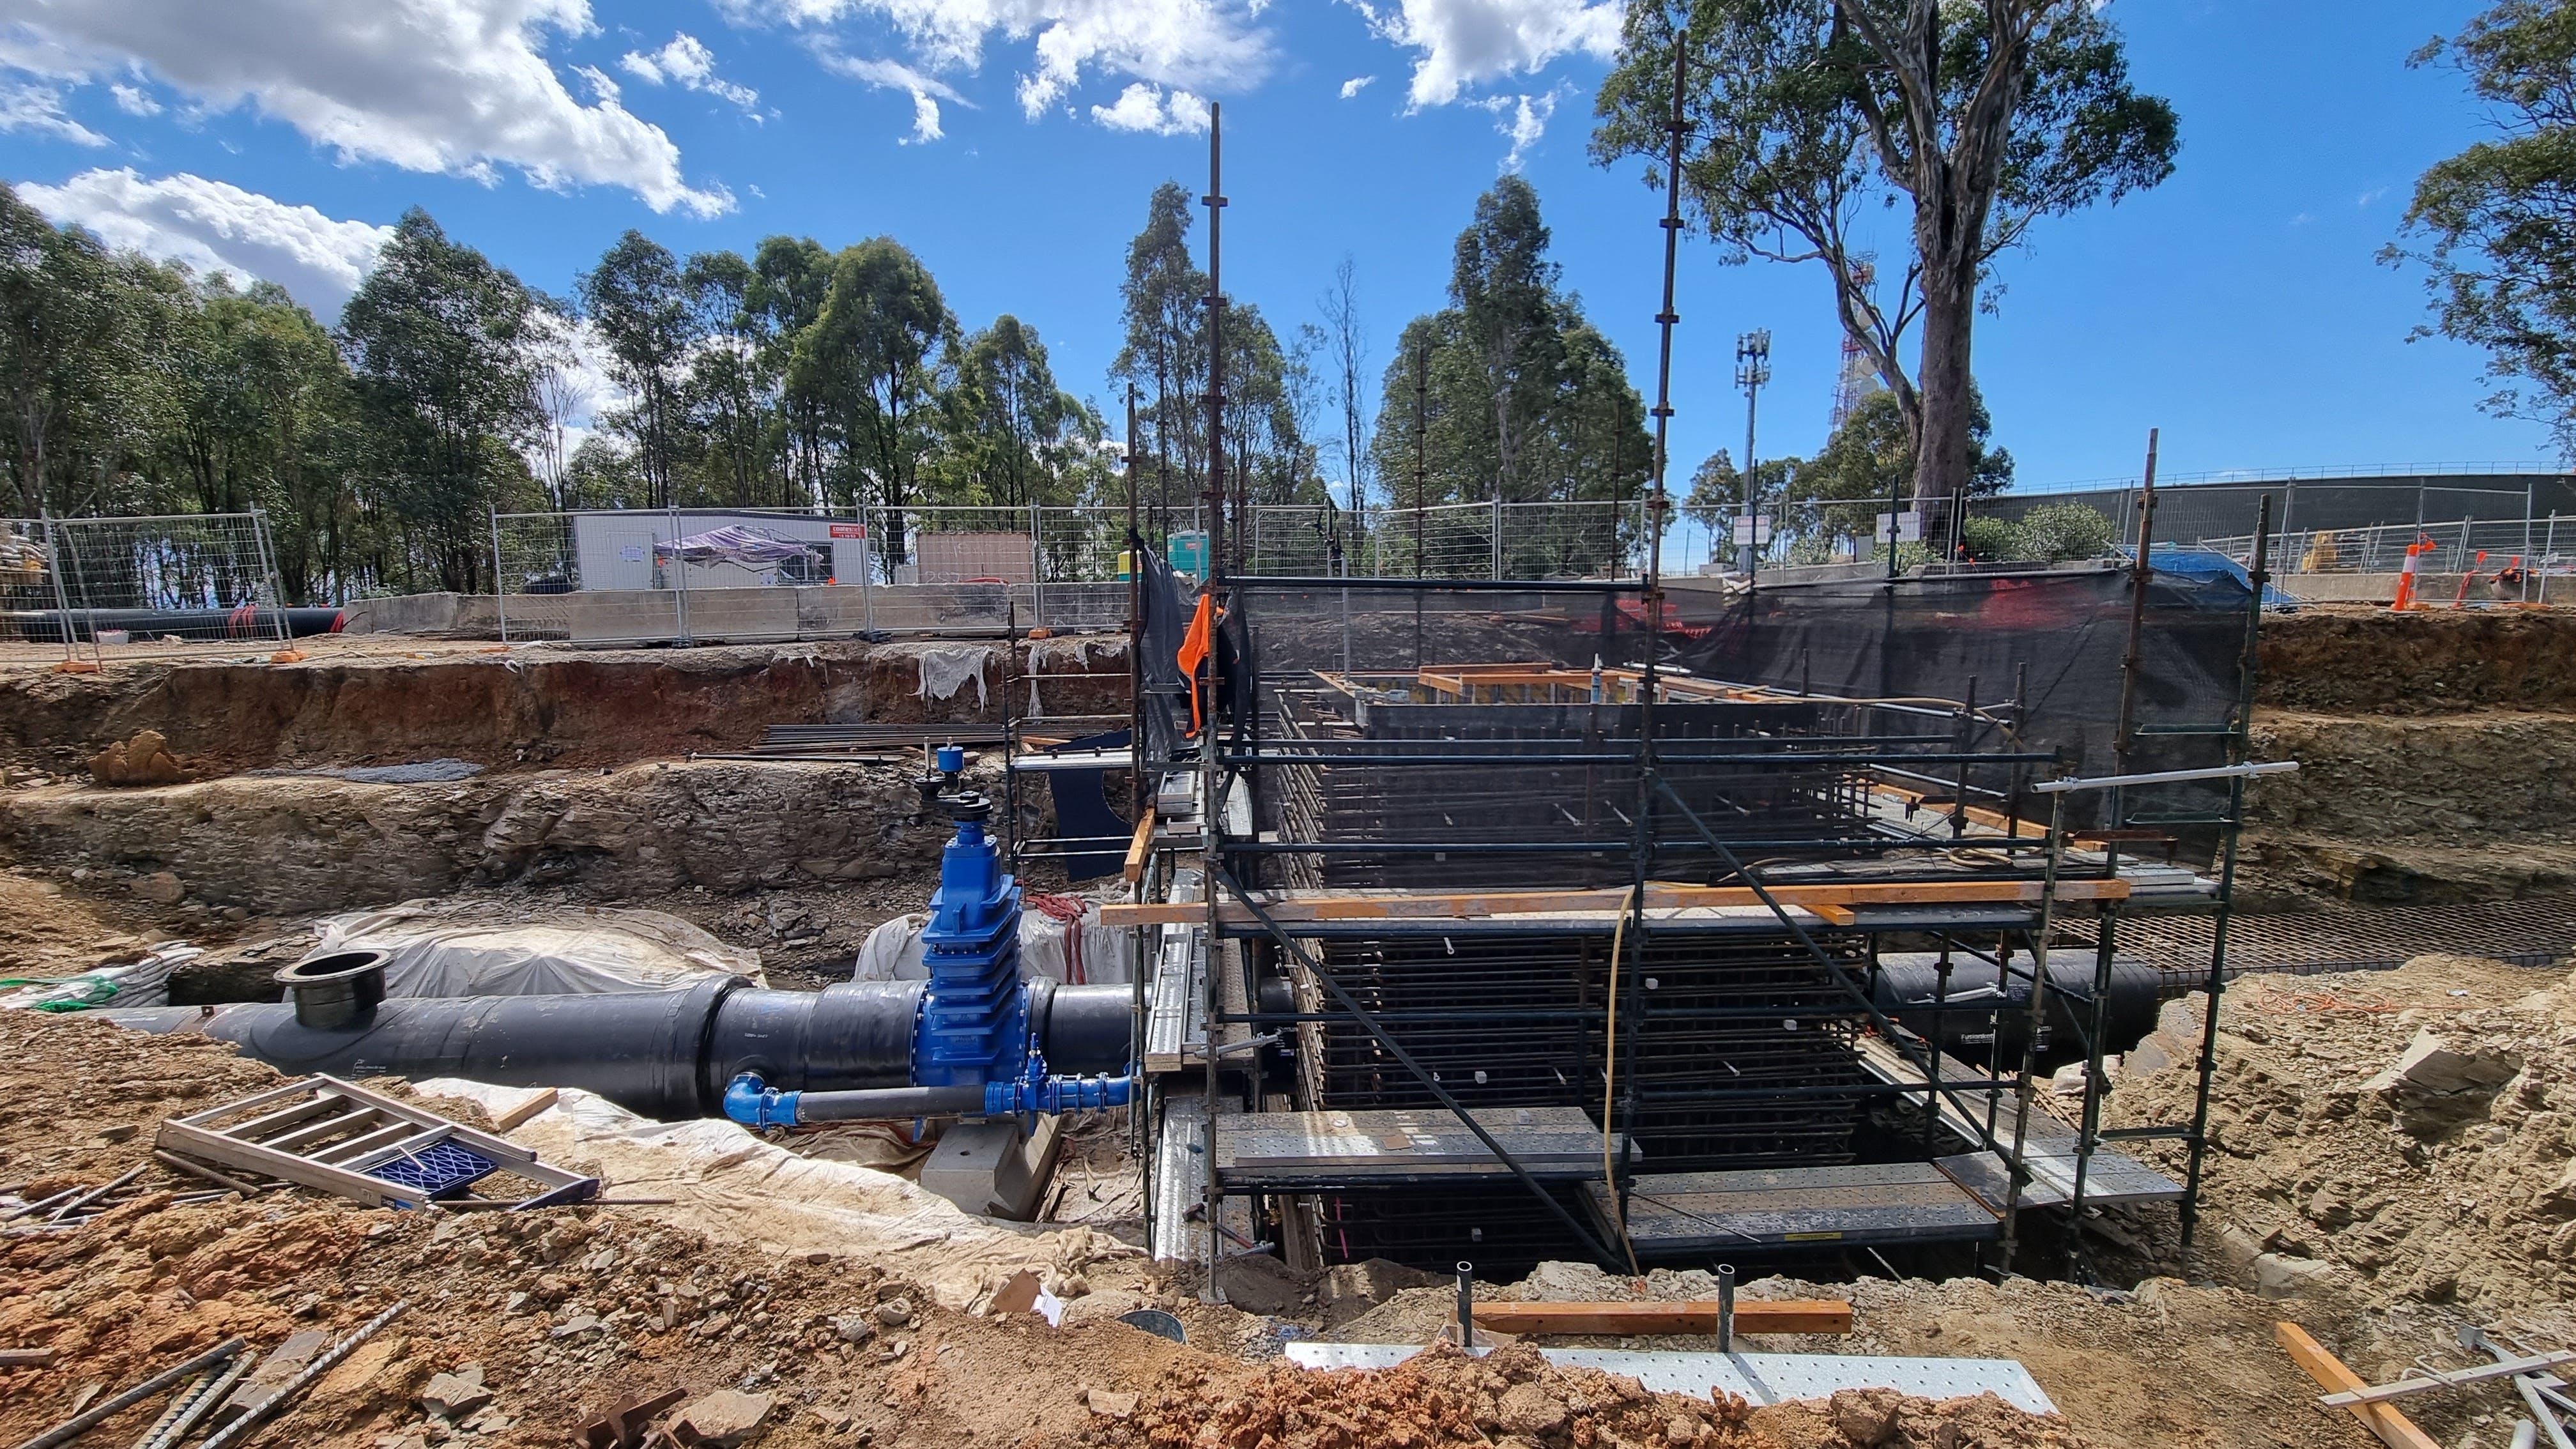 Cecil Park Reservoir butterfly valve pit - September 2021